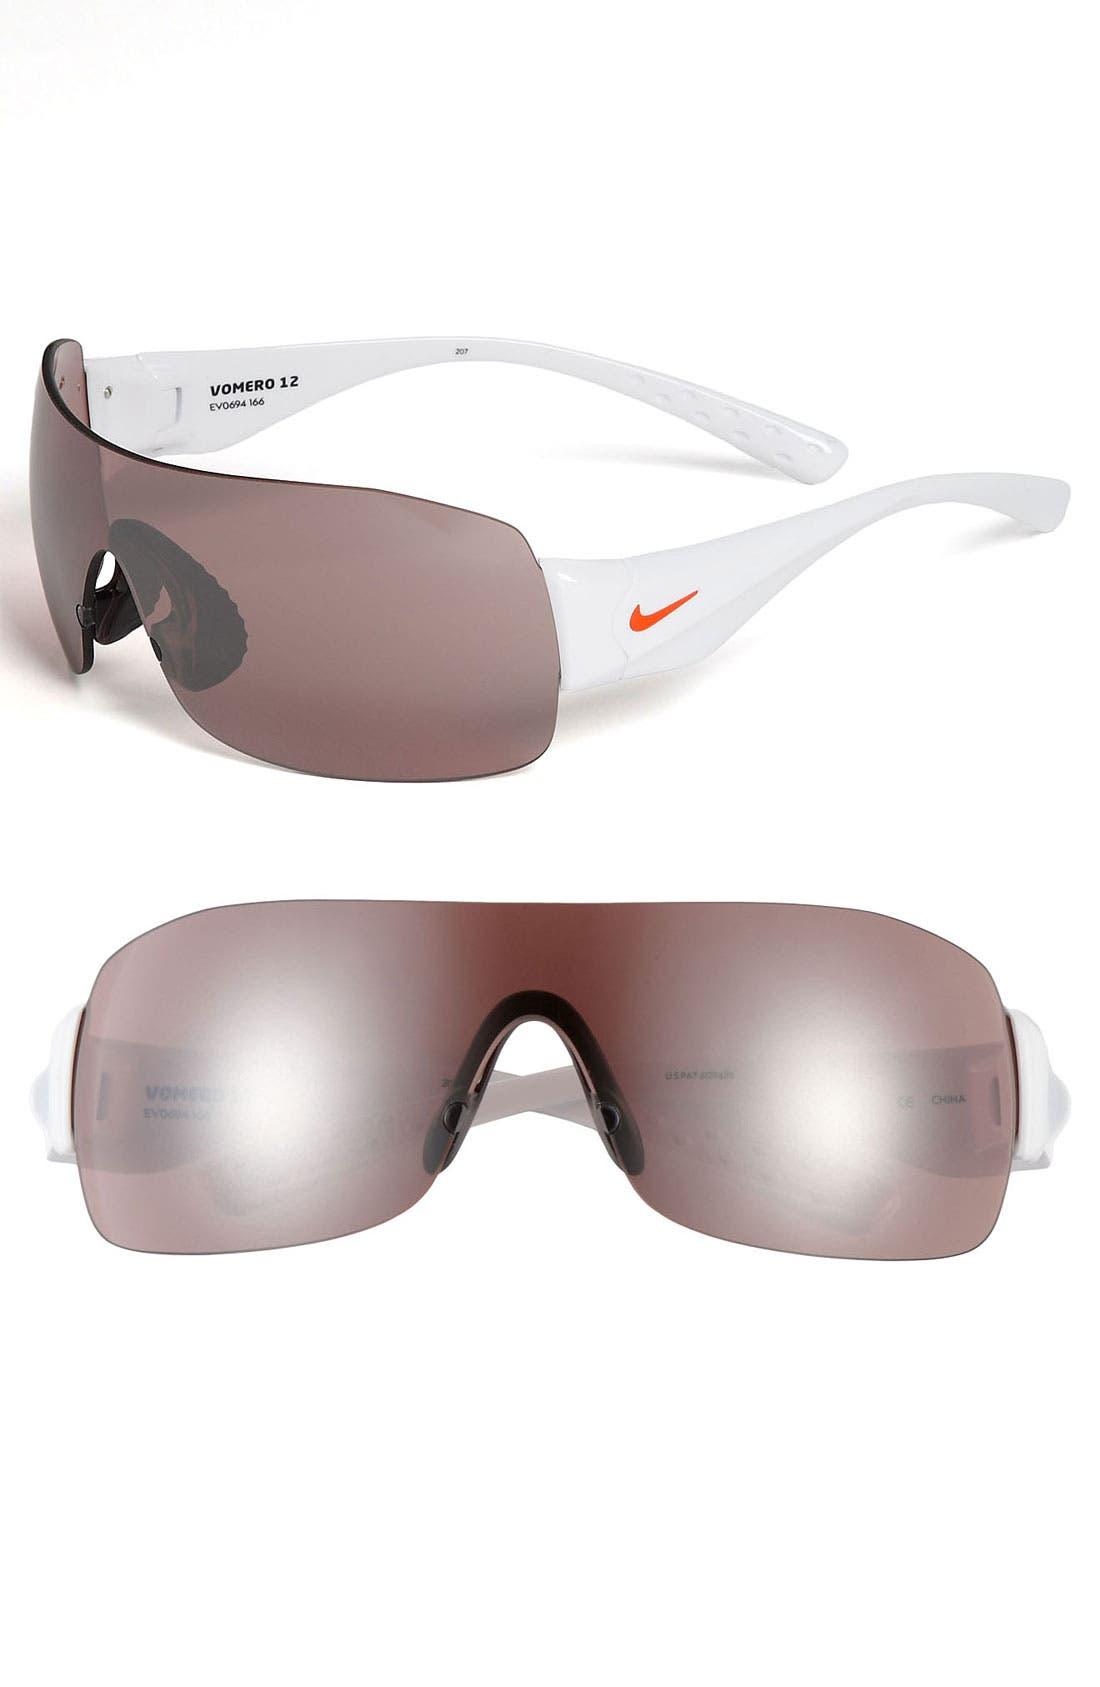 Main Image - Nike 'Vomero 12.E' 59mm Sunglasses